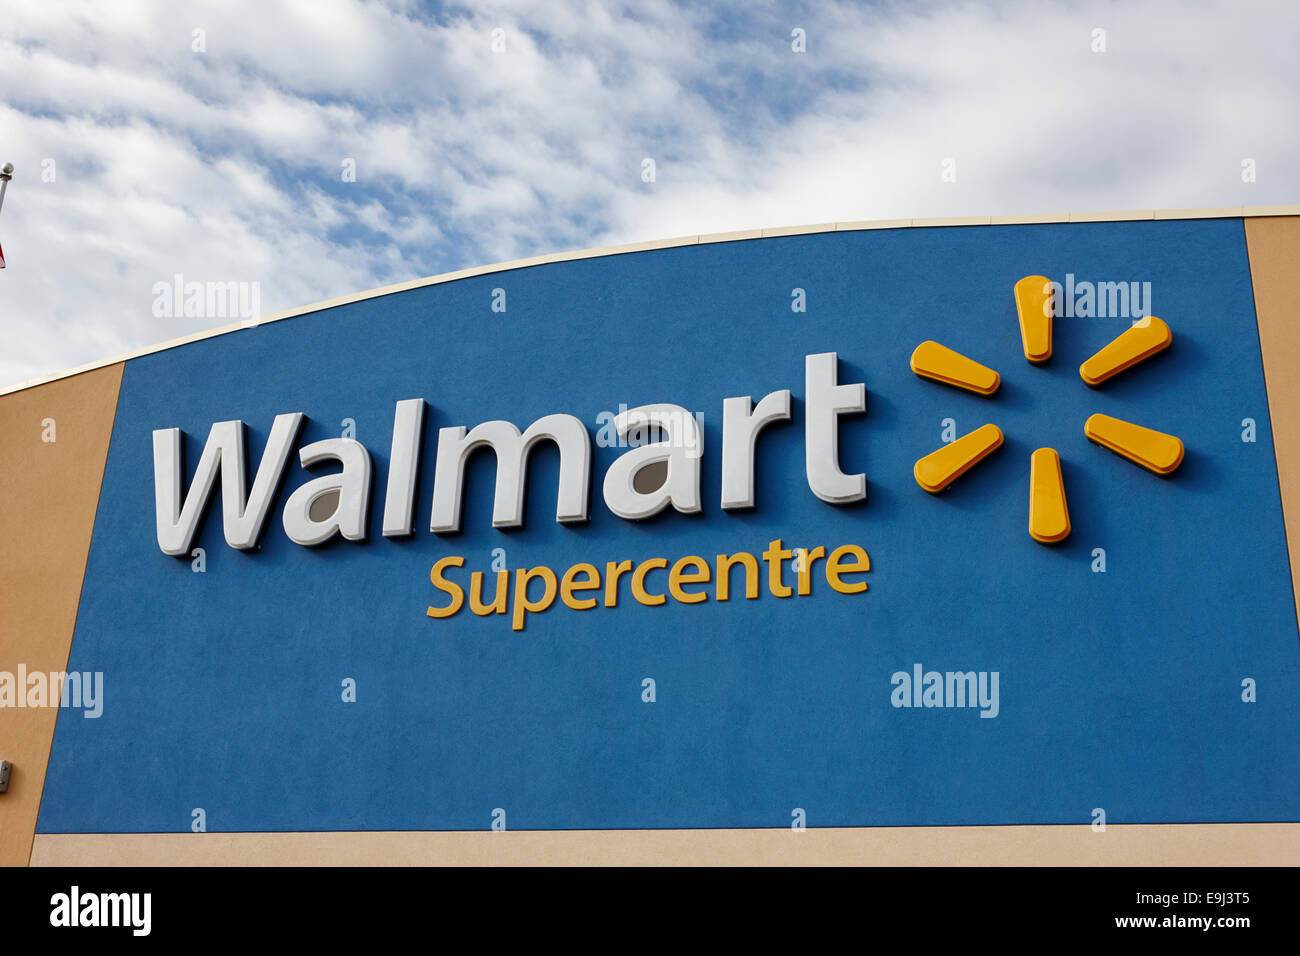 Walmart Supercentre Wal Mart Supercenter Stock Photos & Walmart ...